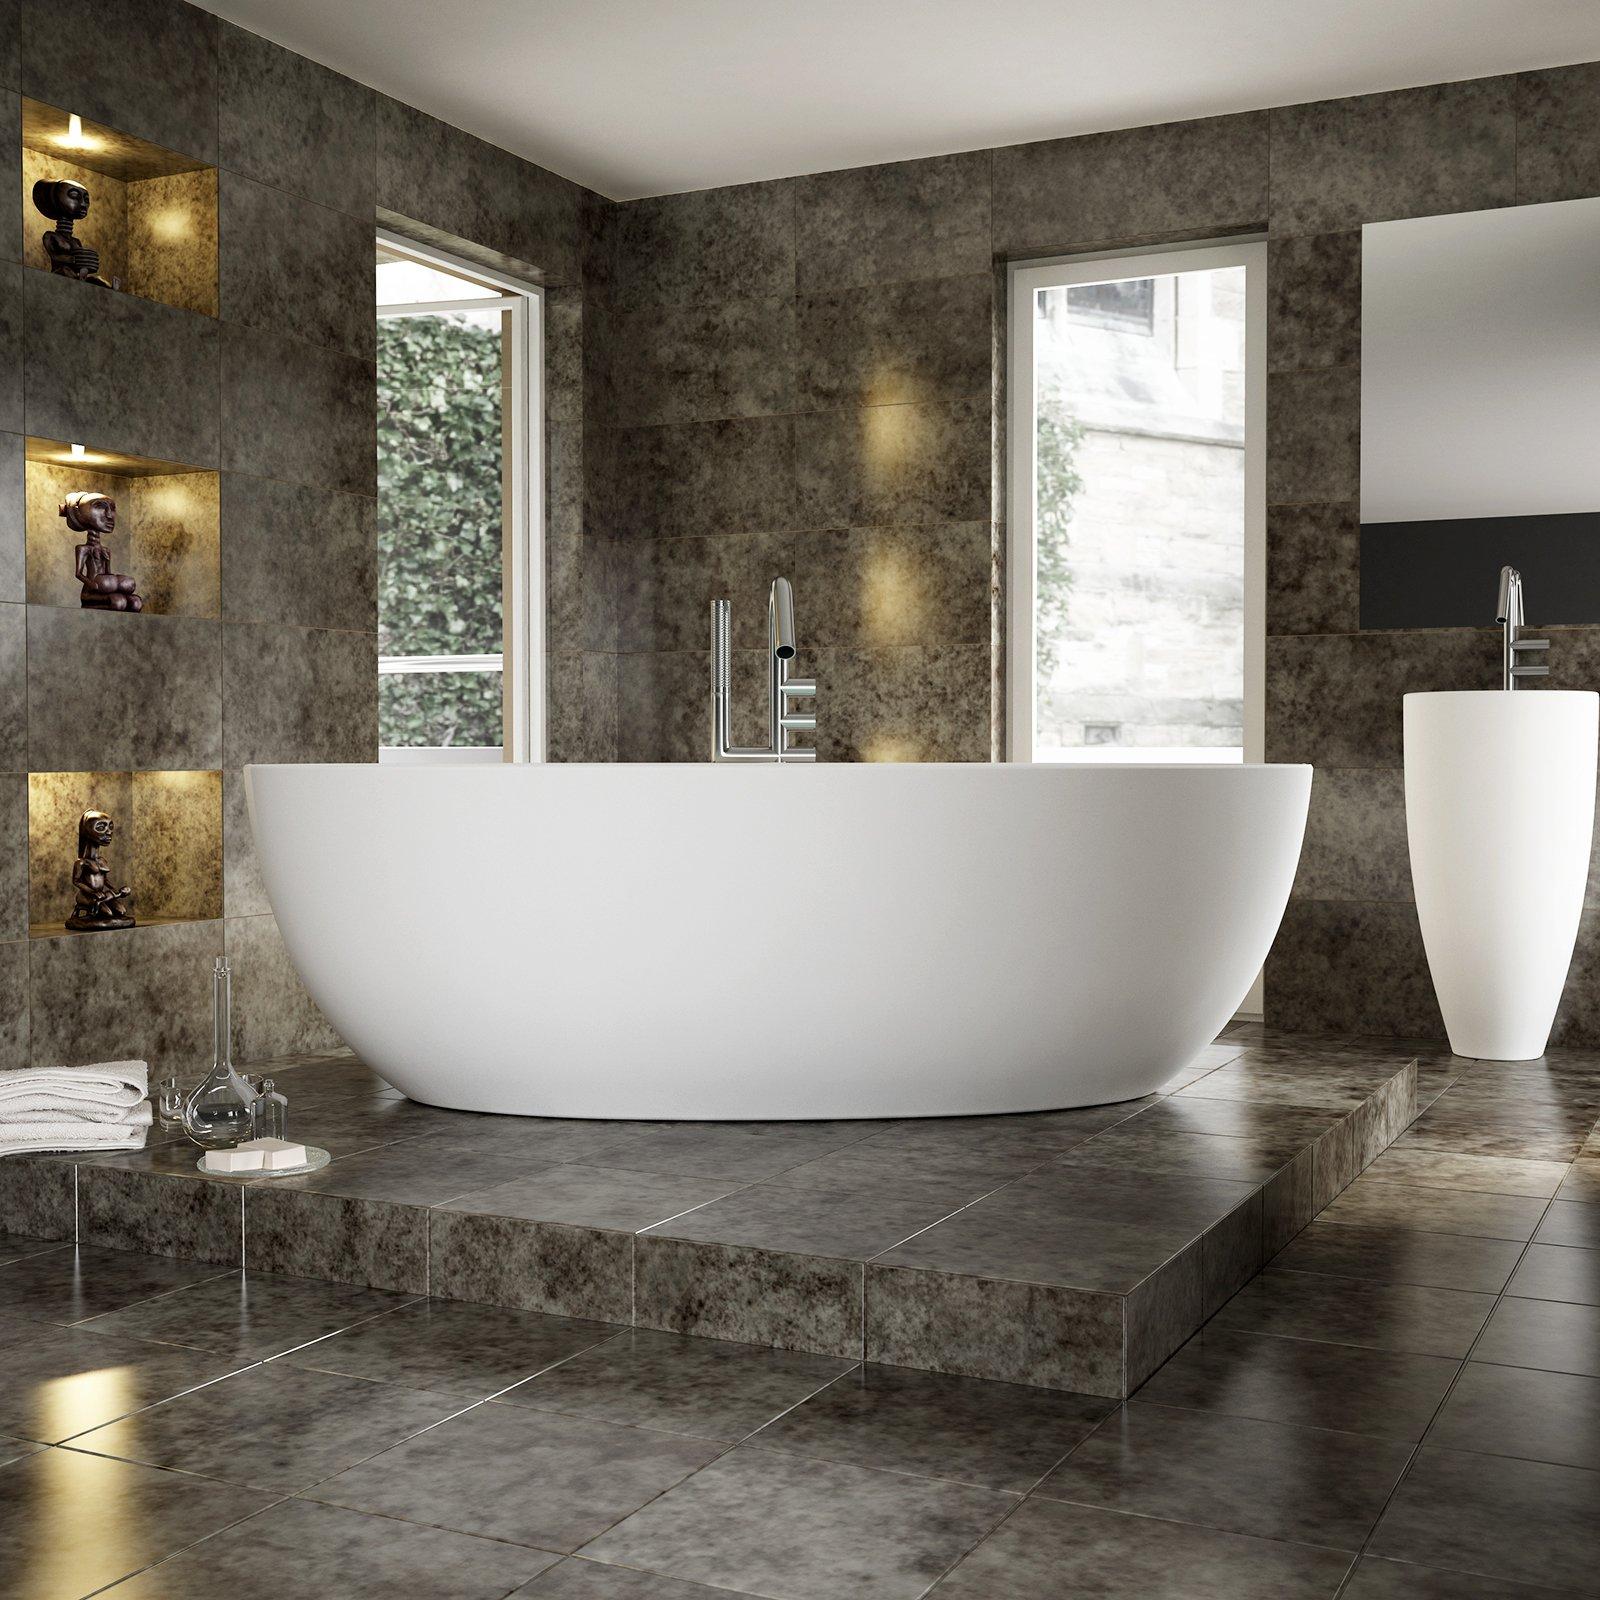 Freistehende Badewanne TERRA Acryl - 186 x 88 cm - Weiß glänzend zoom thumbnail 3